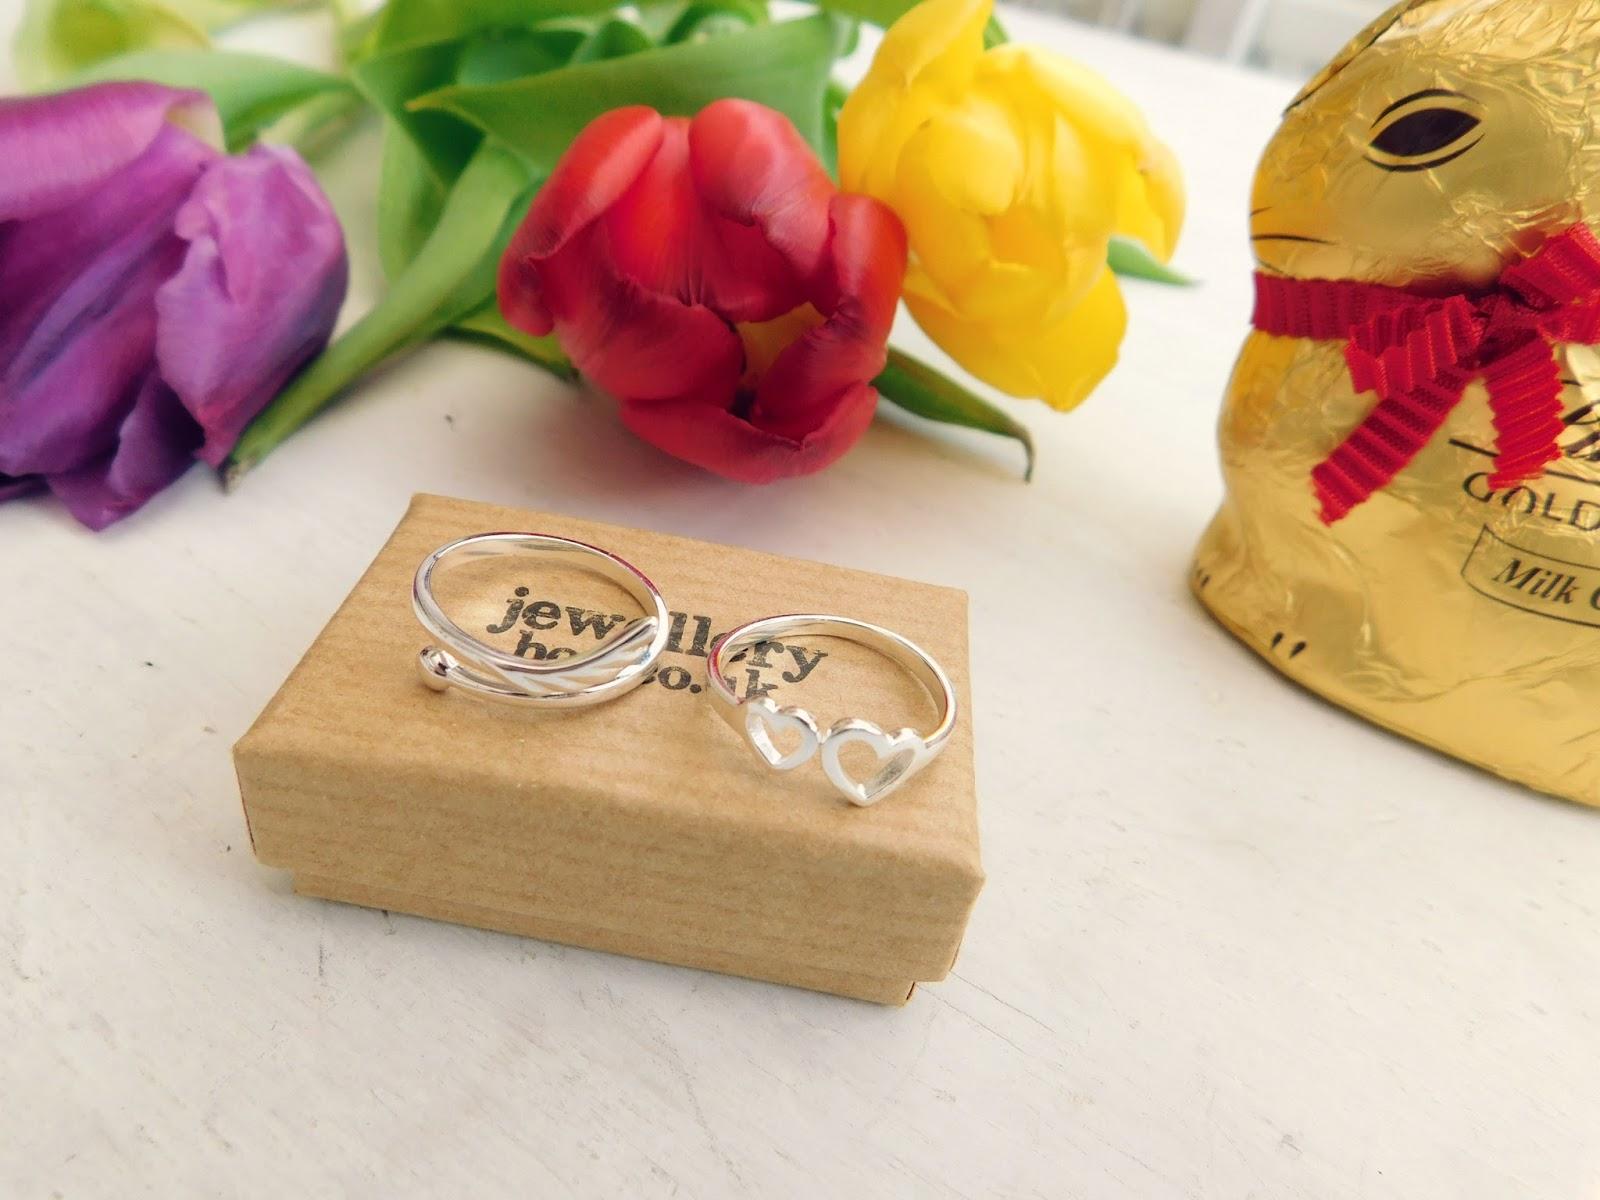 Jewellery Box, New Jewellery